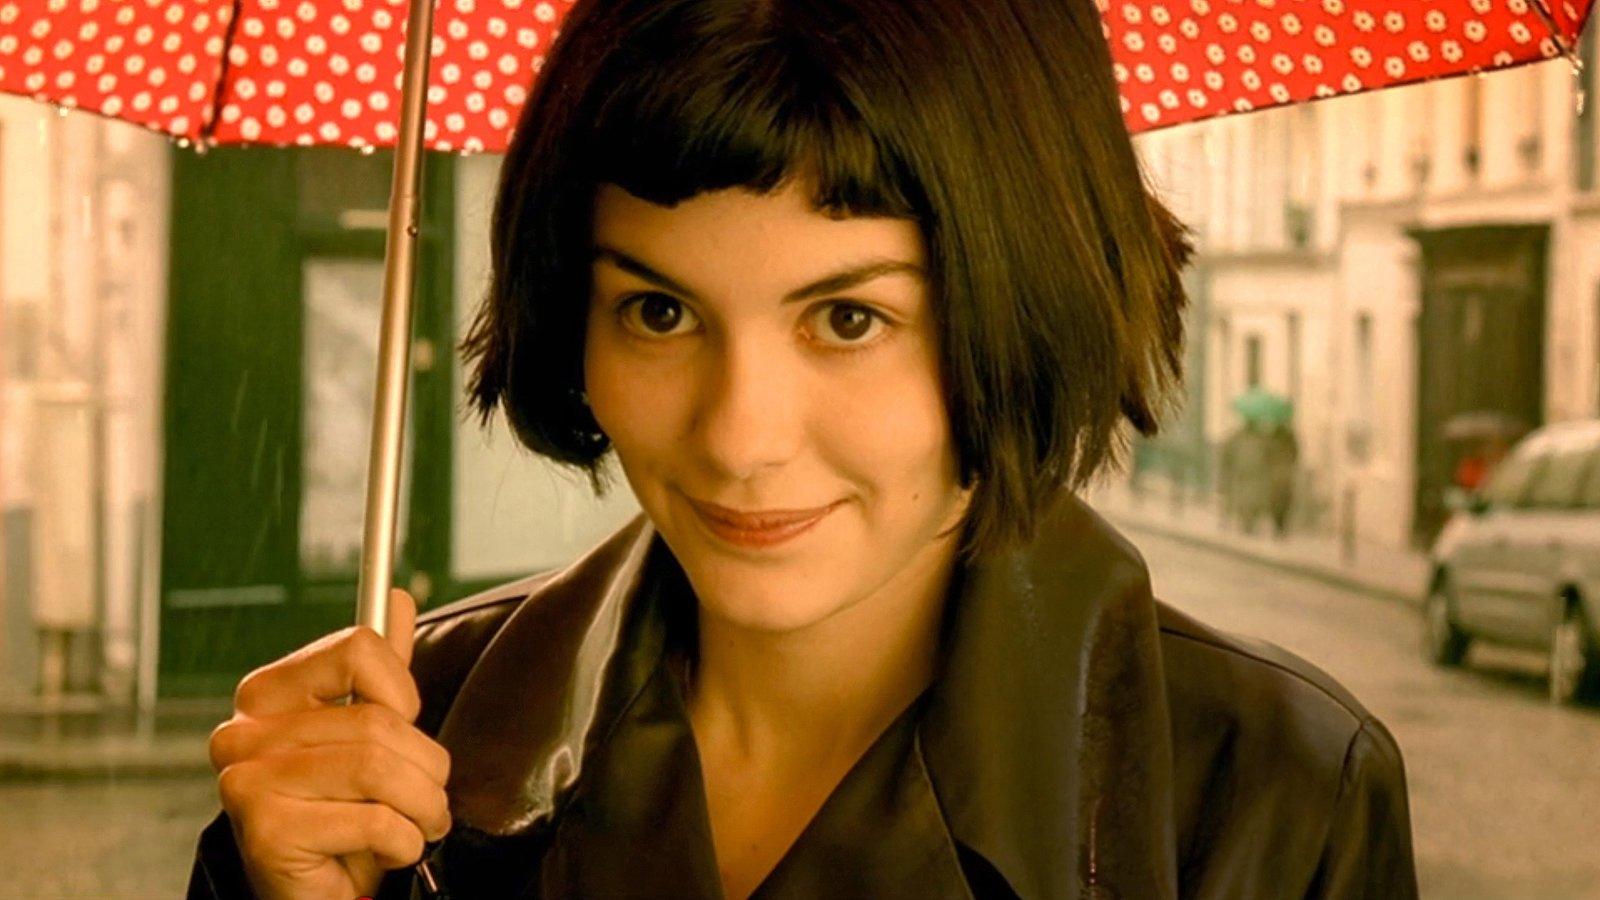 60. Amelia (2001)